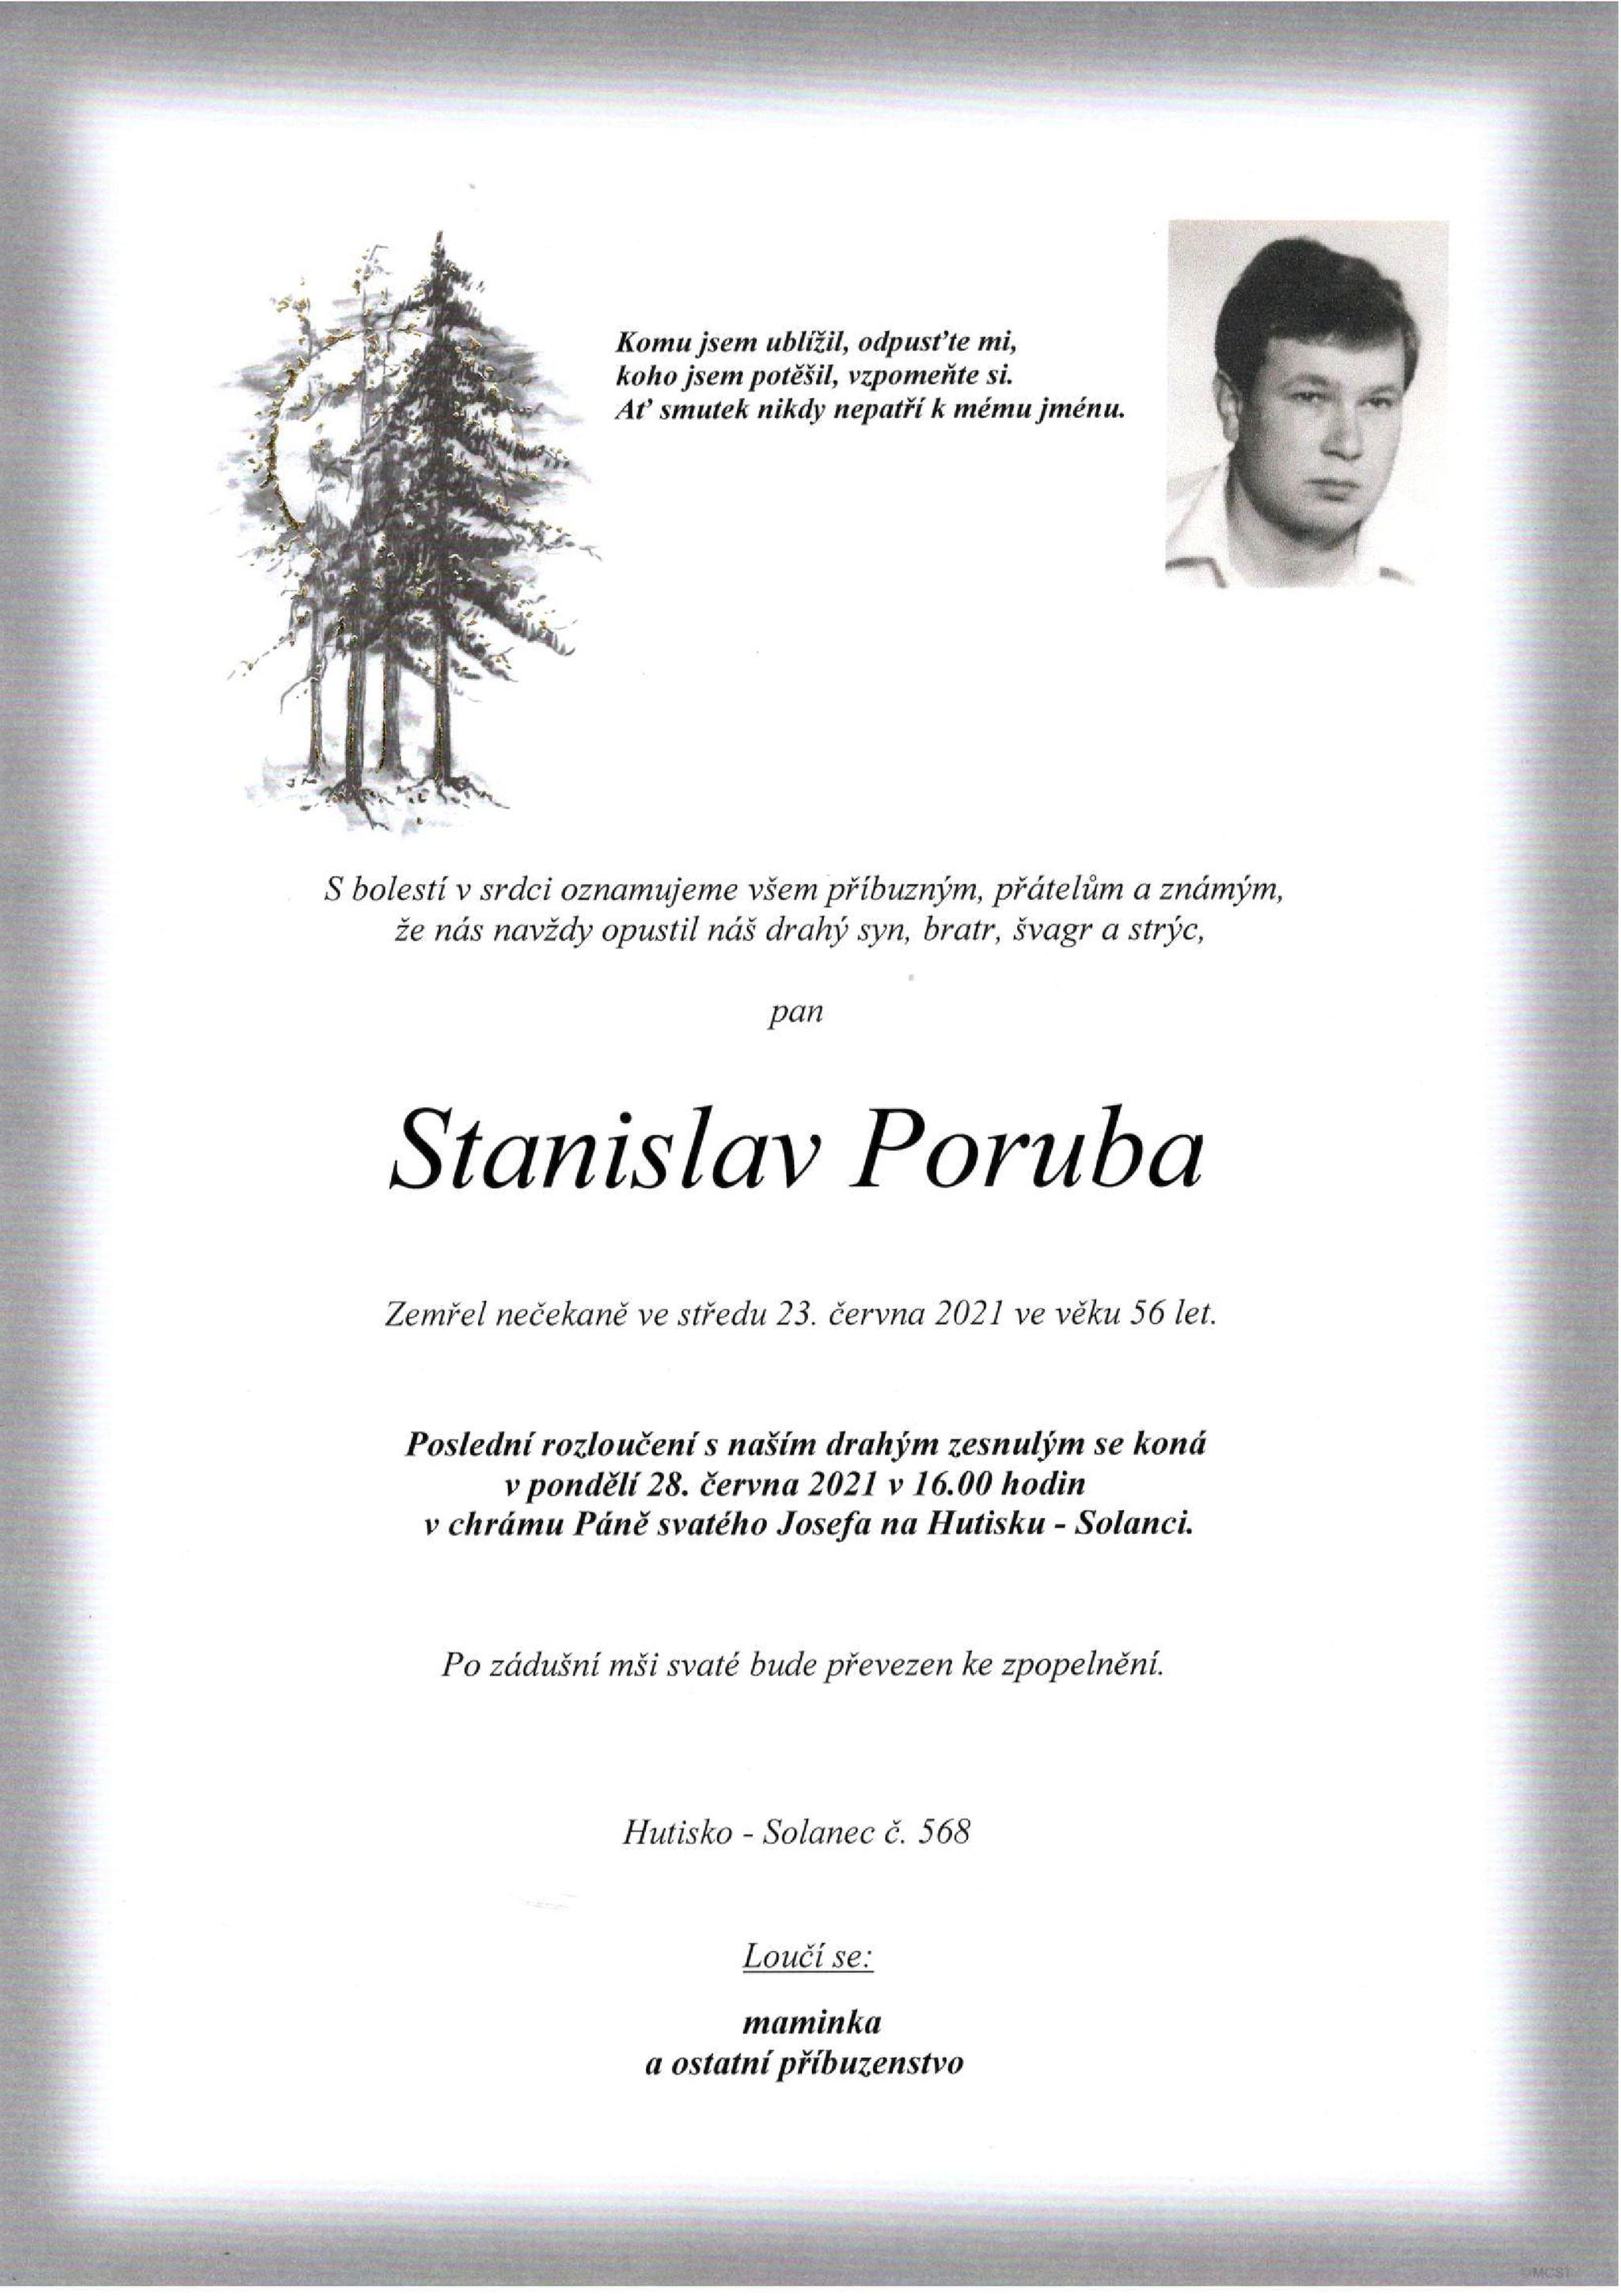 Stanislav Poruba